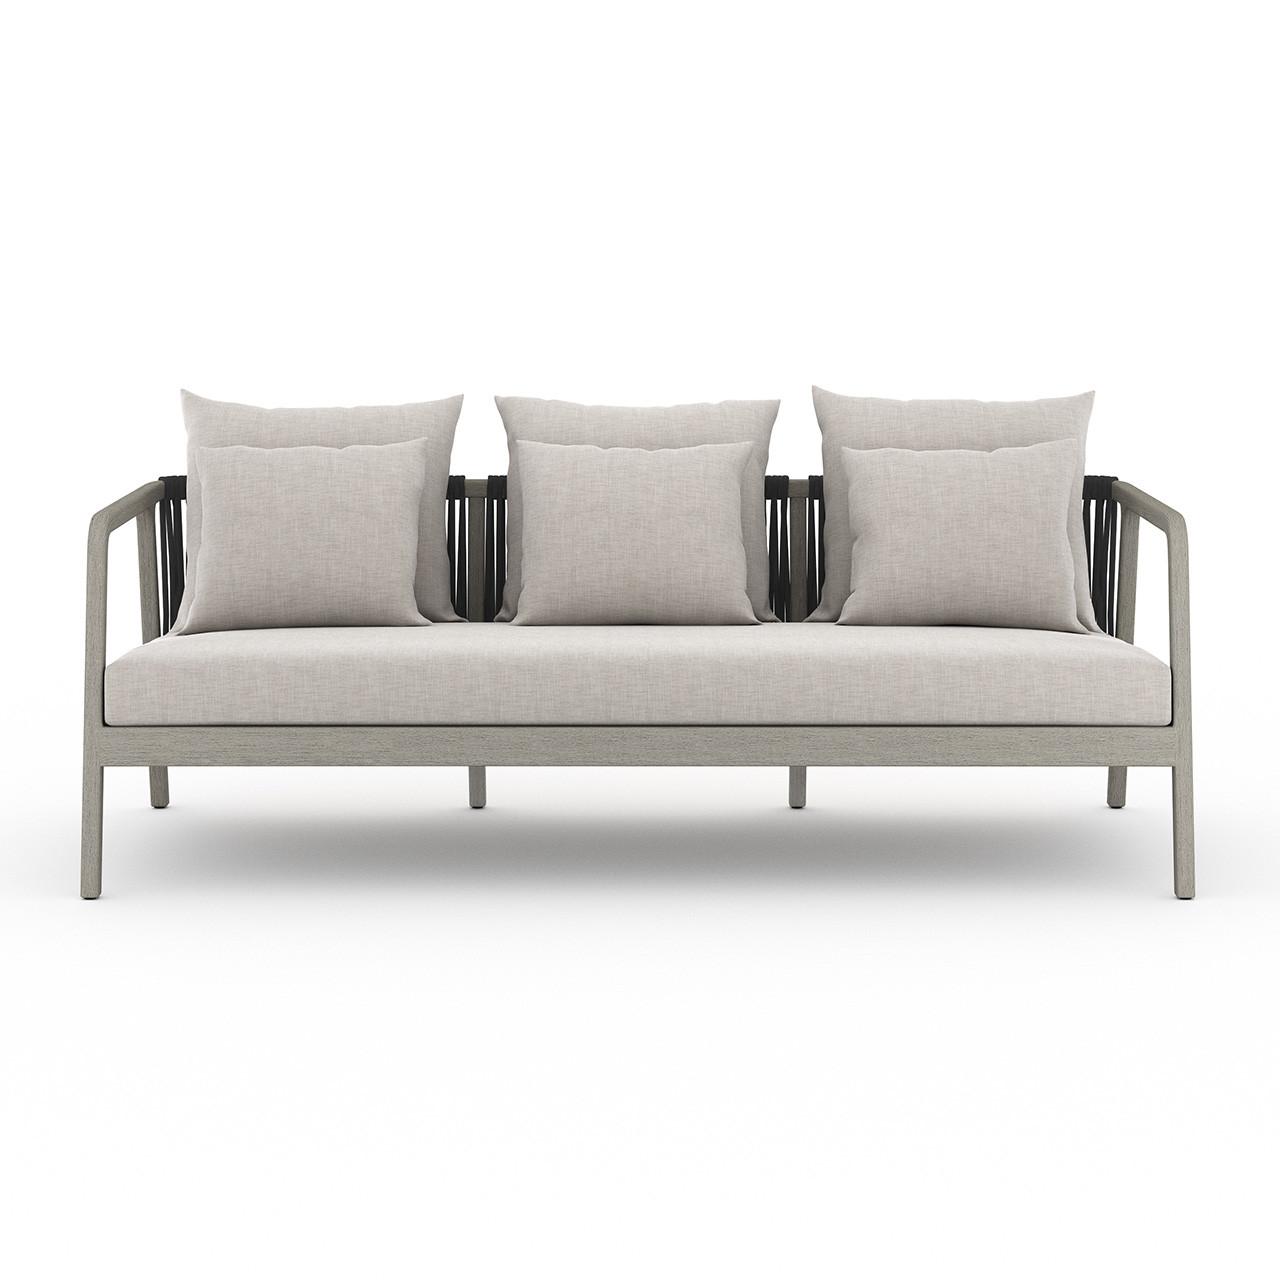 La Palma Teak Outdoor Sofas - Weathered Grey